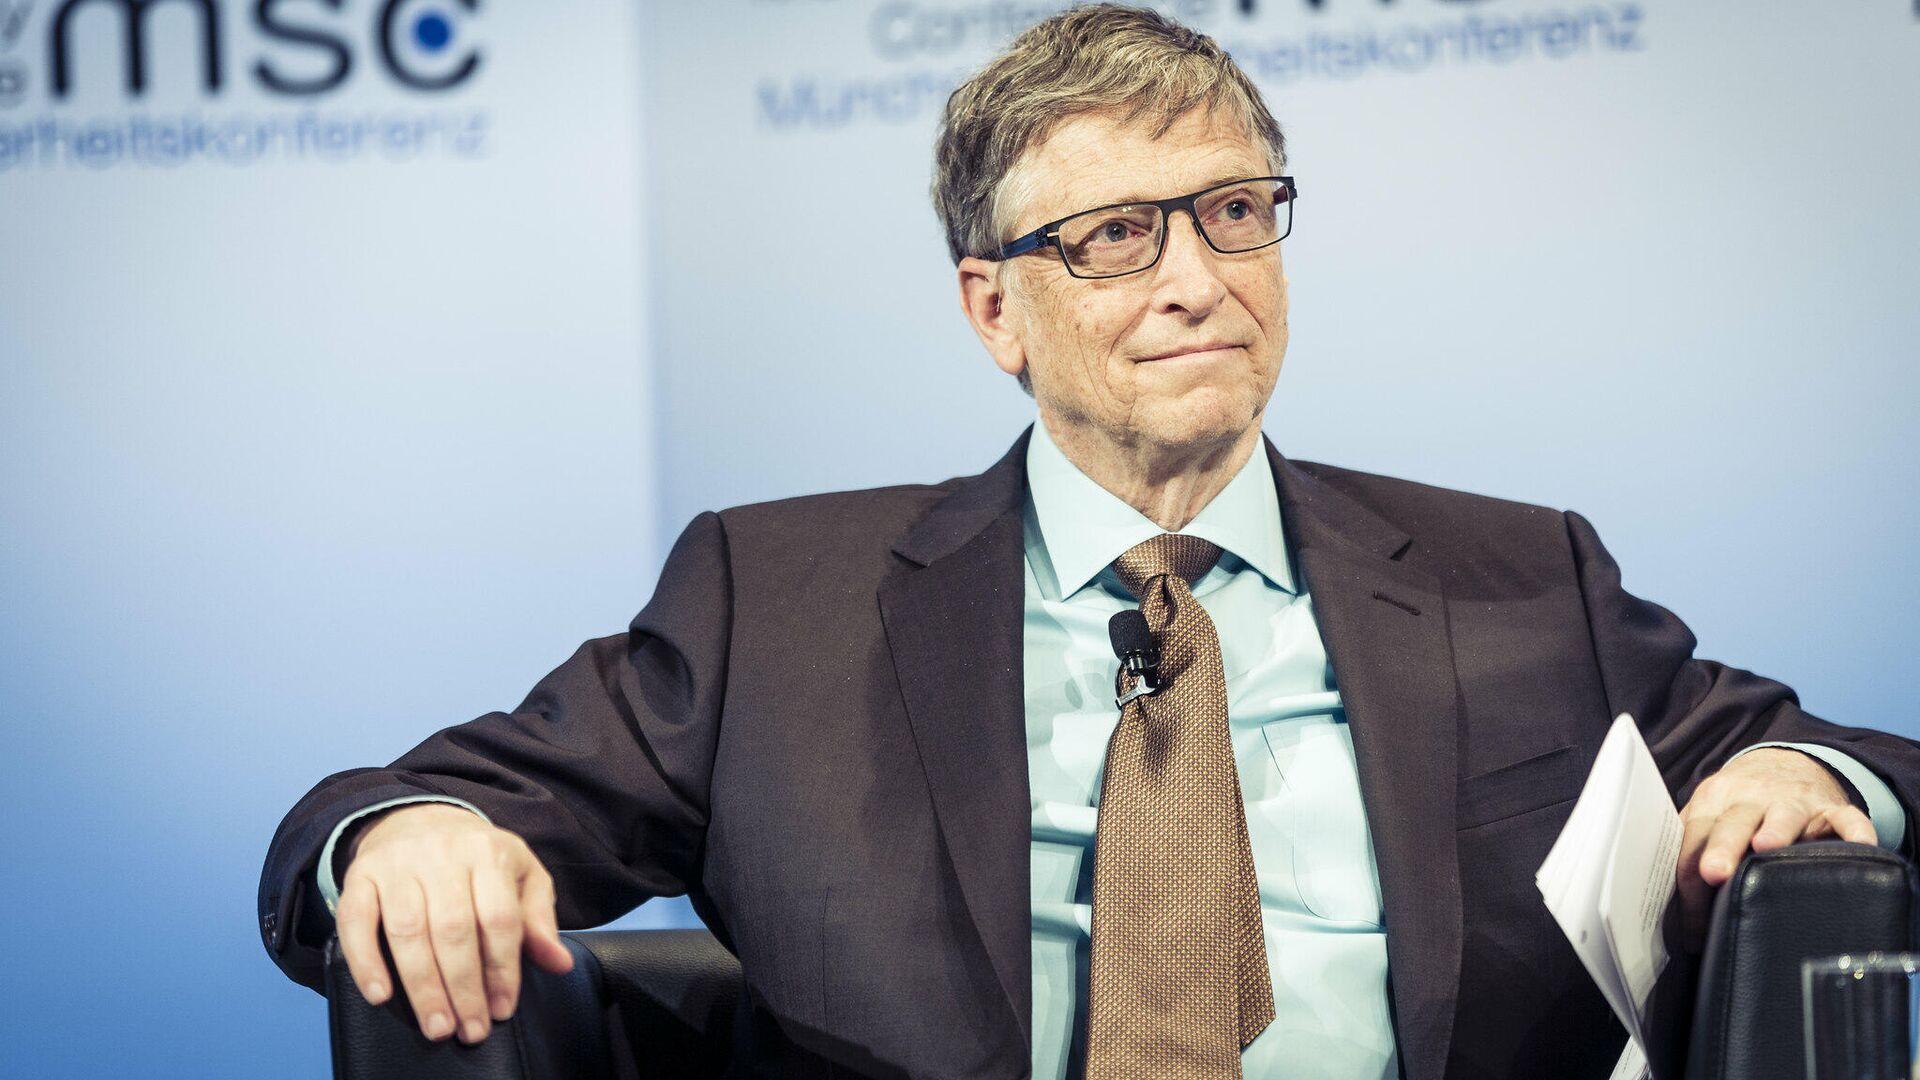 El fundador de Microsoft Bill Gates (archivo) - Sputnik Mundo, 1920, 14.09.2021